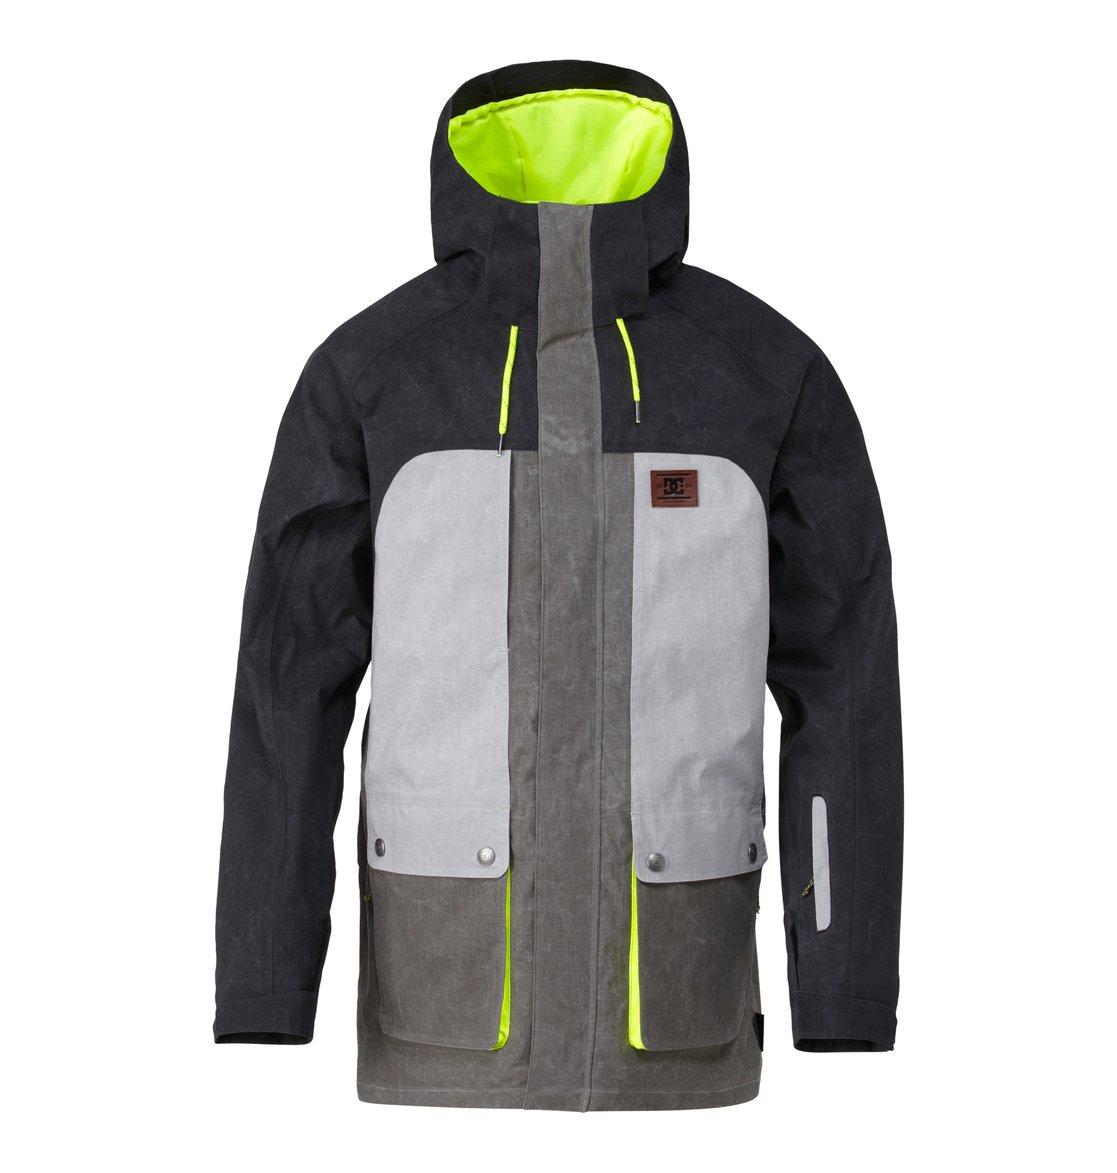 Snow Jacket Men's Edytj00017Dc Kingdom Shoes N8mwvOn0